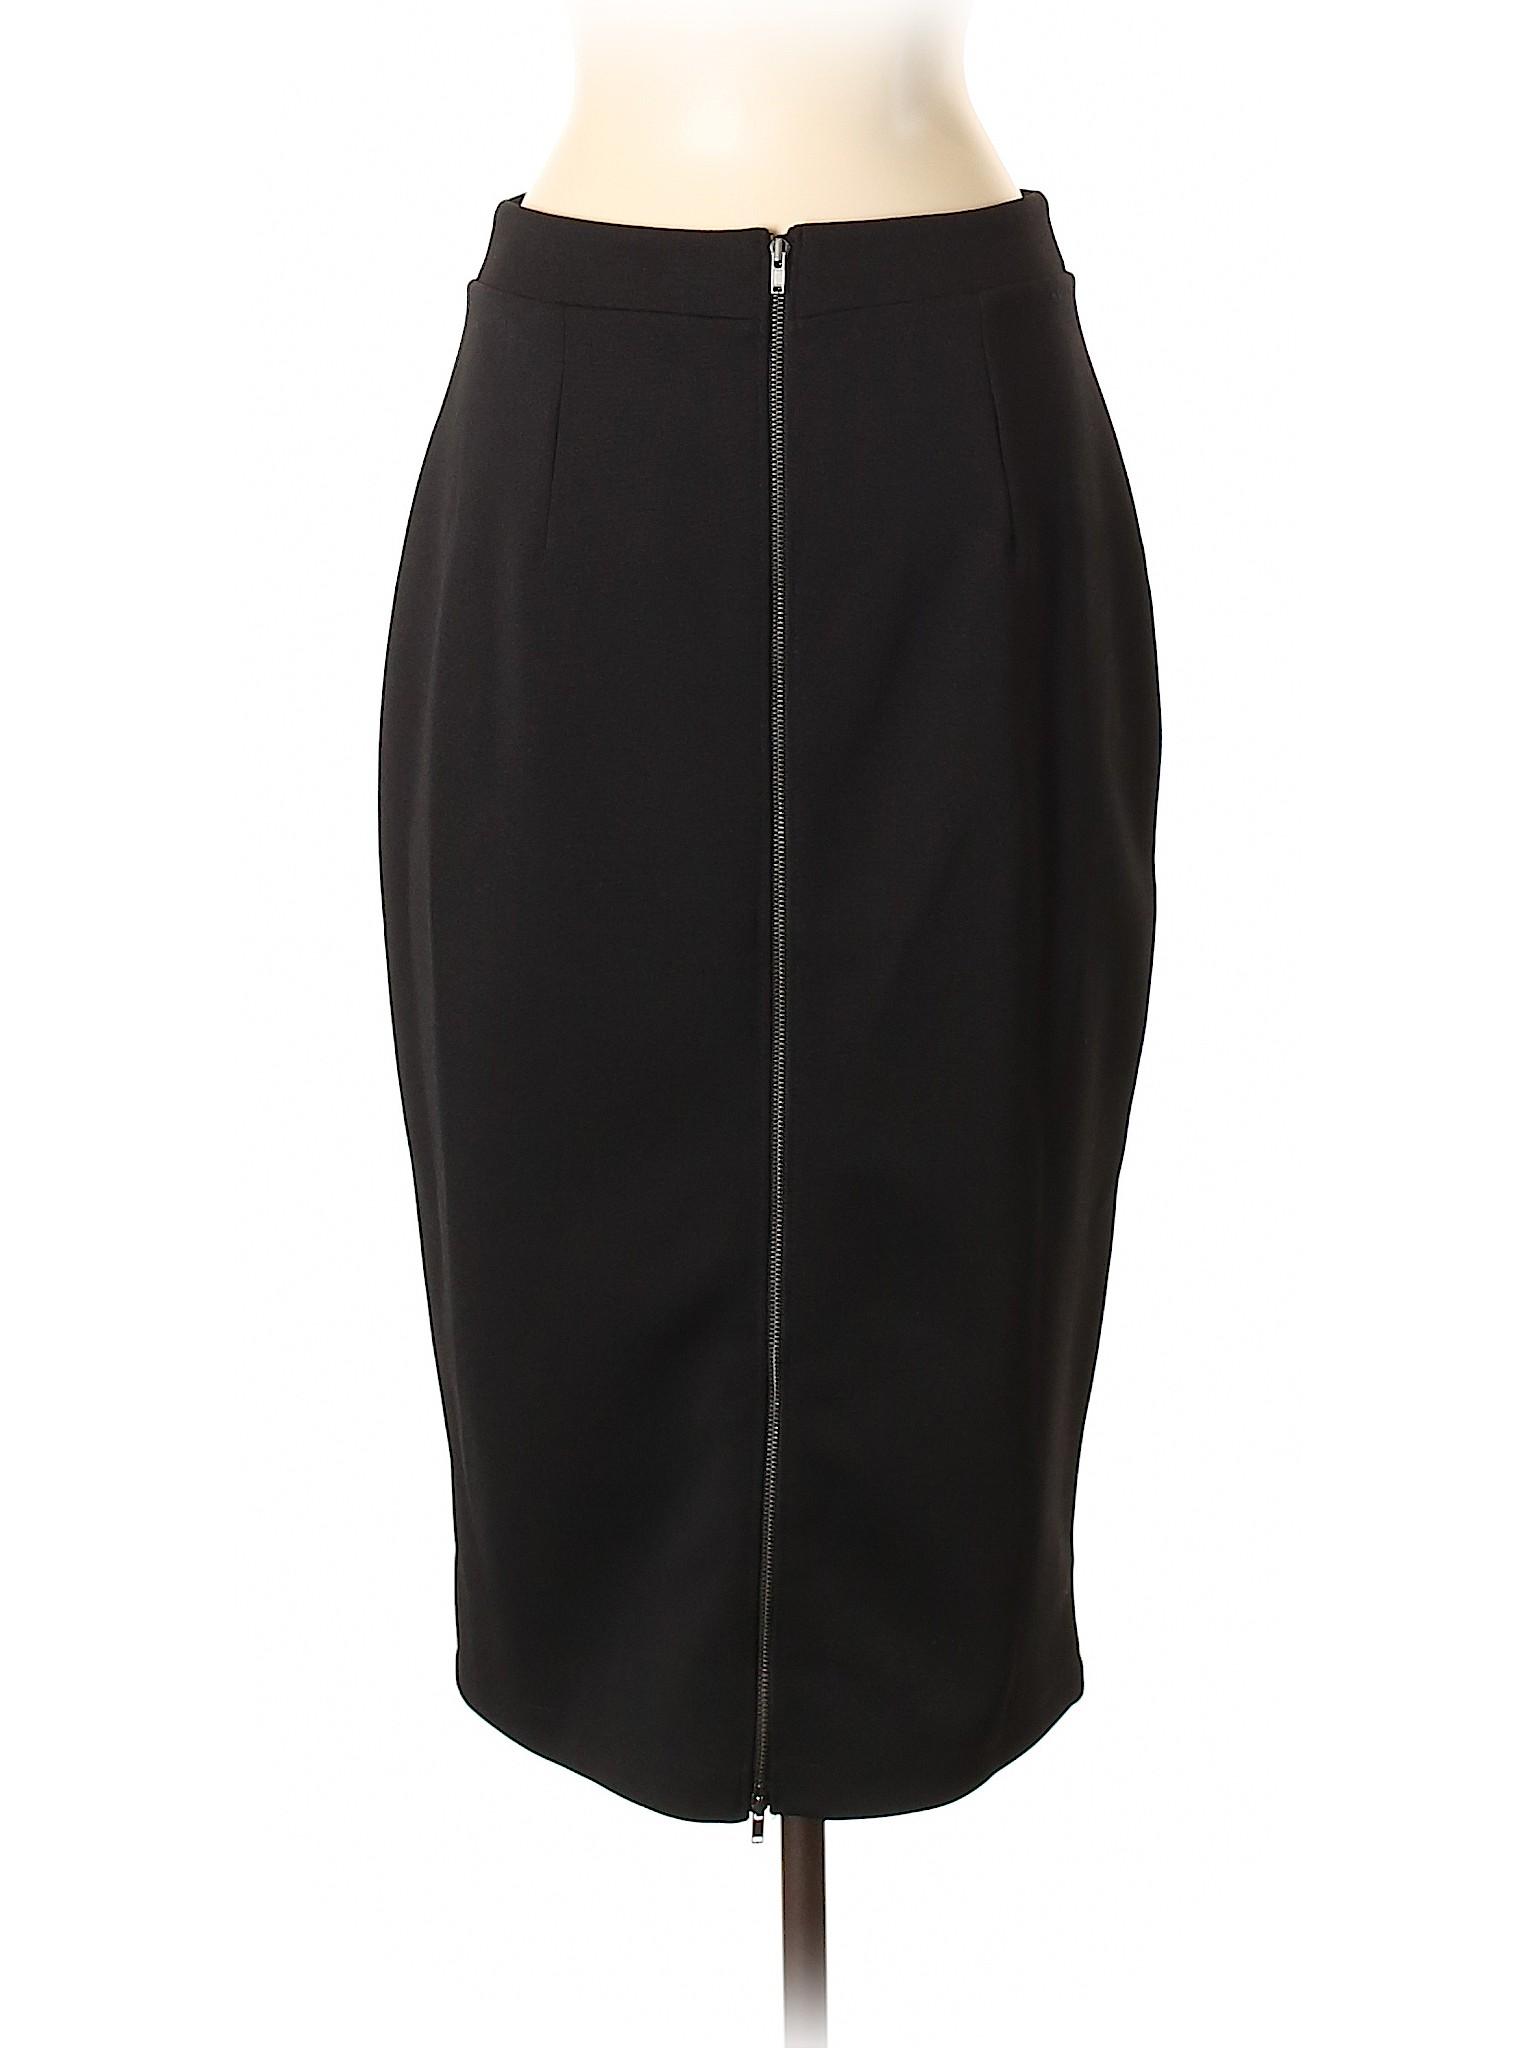 Boutique Skirt Boutique Skirt Casual Skirt Casual Boutique Casual Skirt Casual Boutique Skirt Casual Boutique Casual Boutique dHXHq4Wf